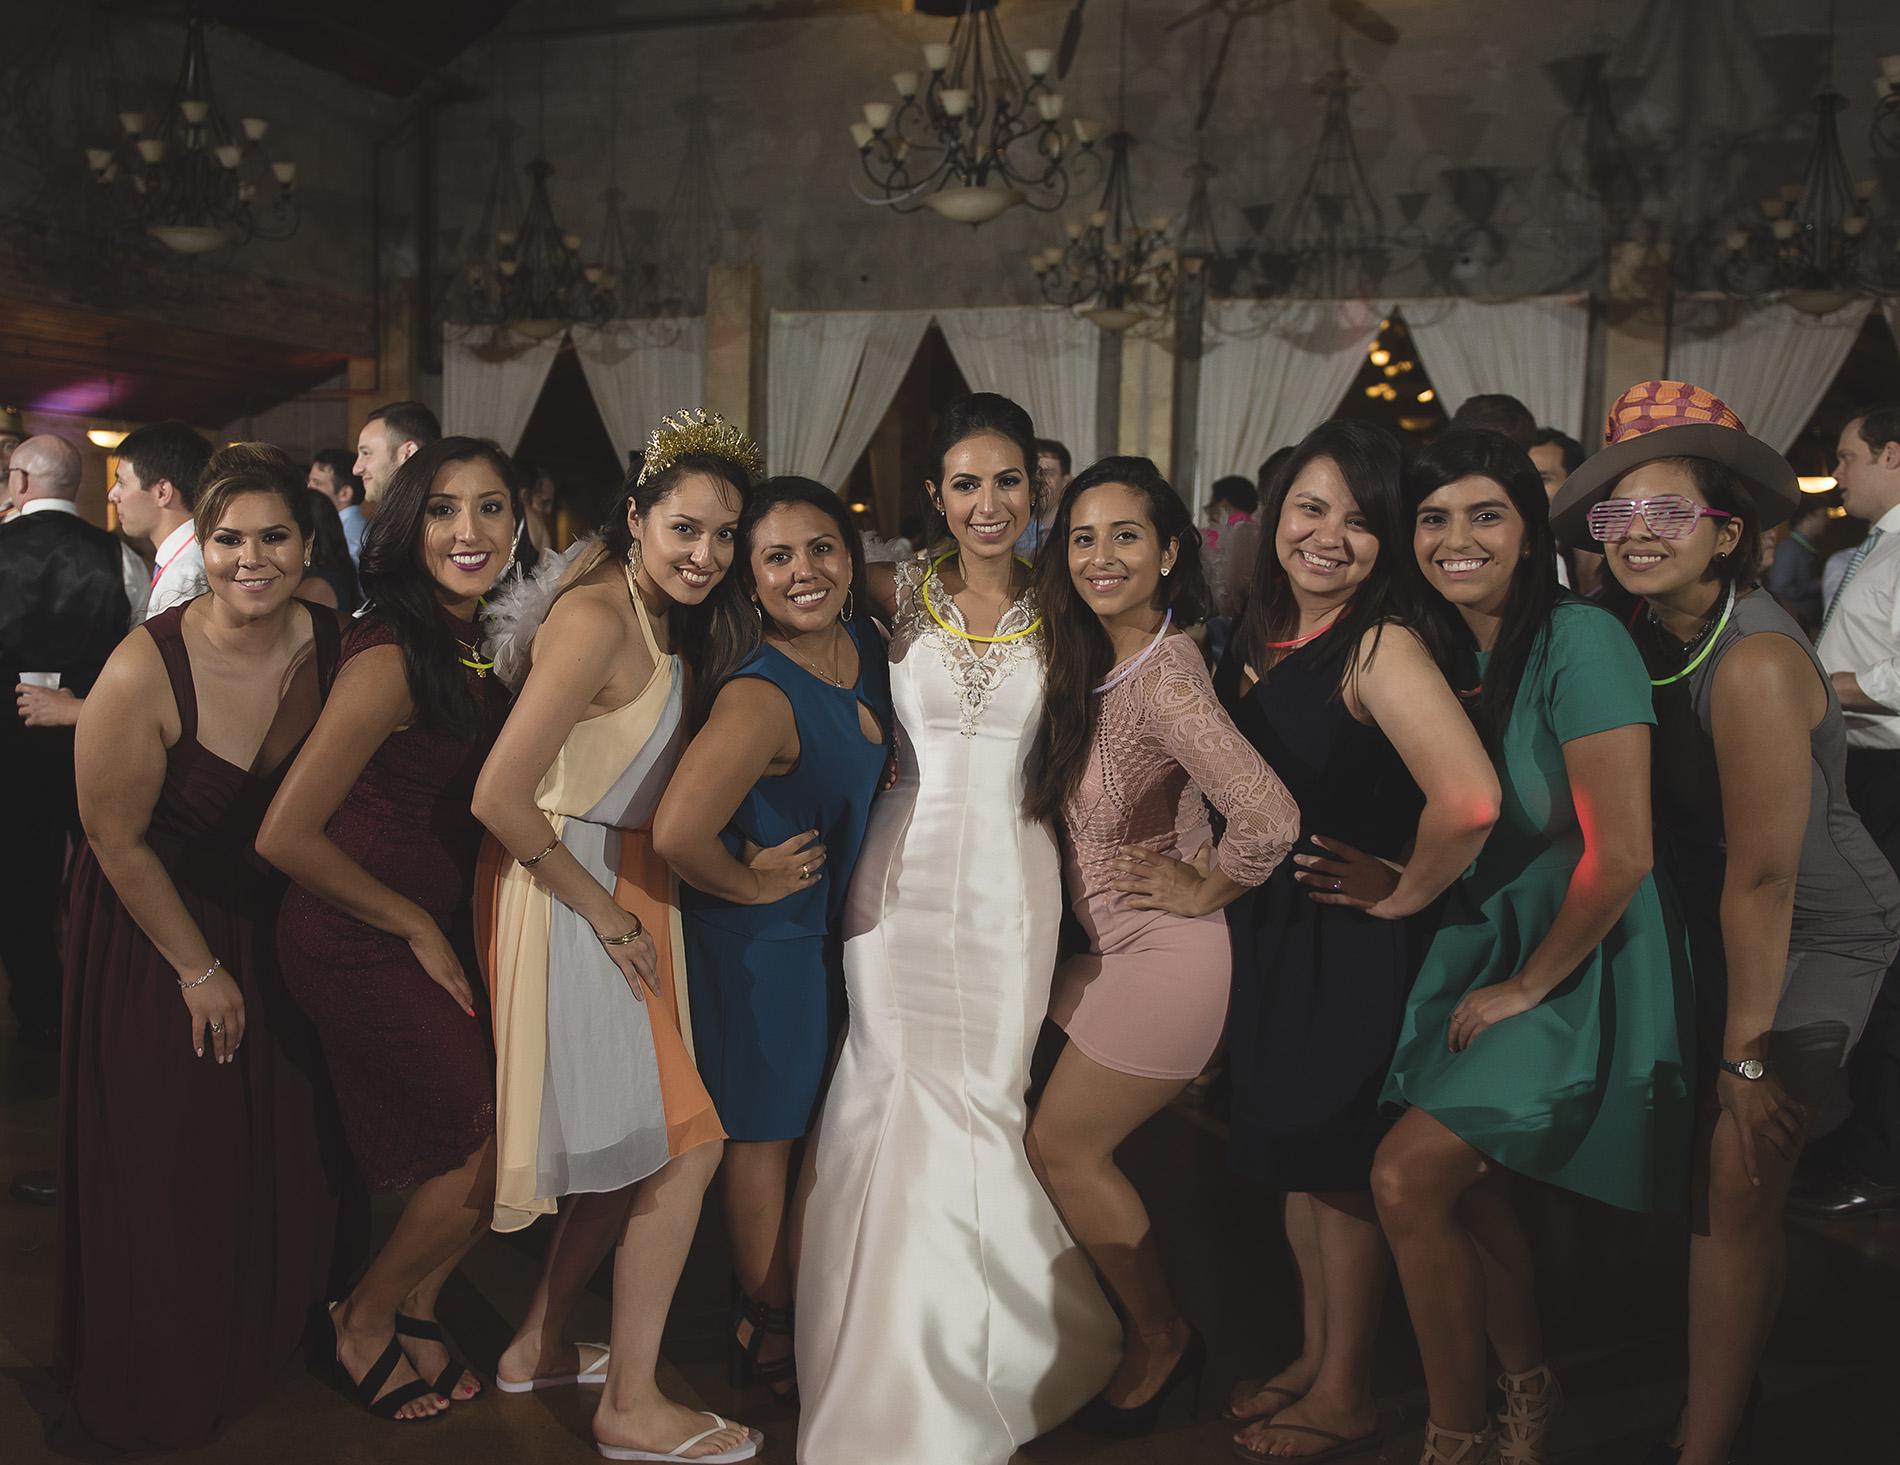 Houston-venue-Olde-Dobbin-Station-Romantic-Classic-Wedding-Photographer-120.jpg